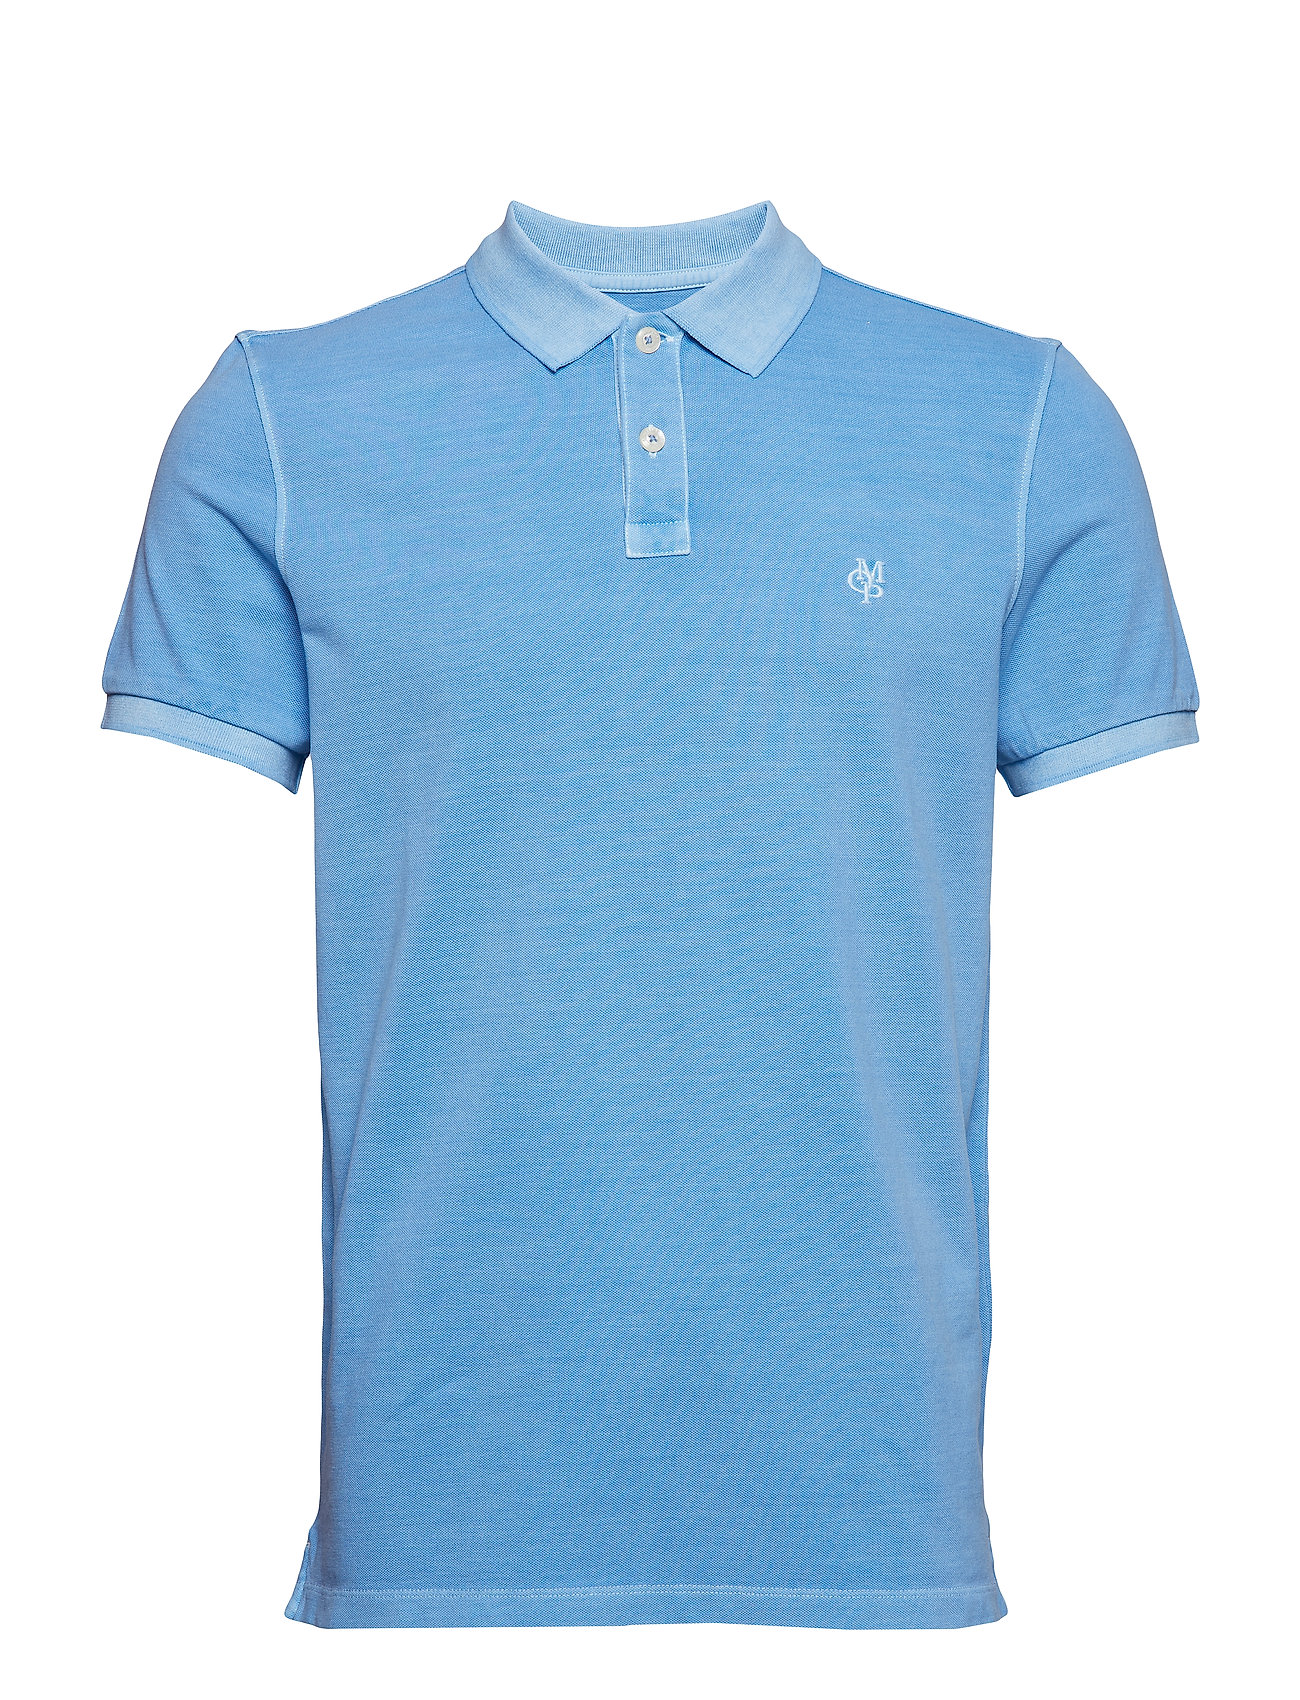 Marc O'Polo Polo Short Sleeve - AZURE BLUE